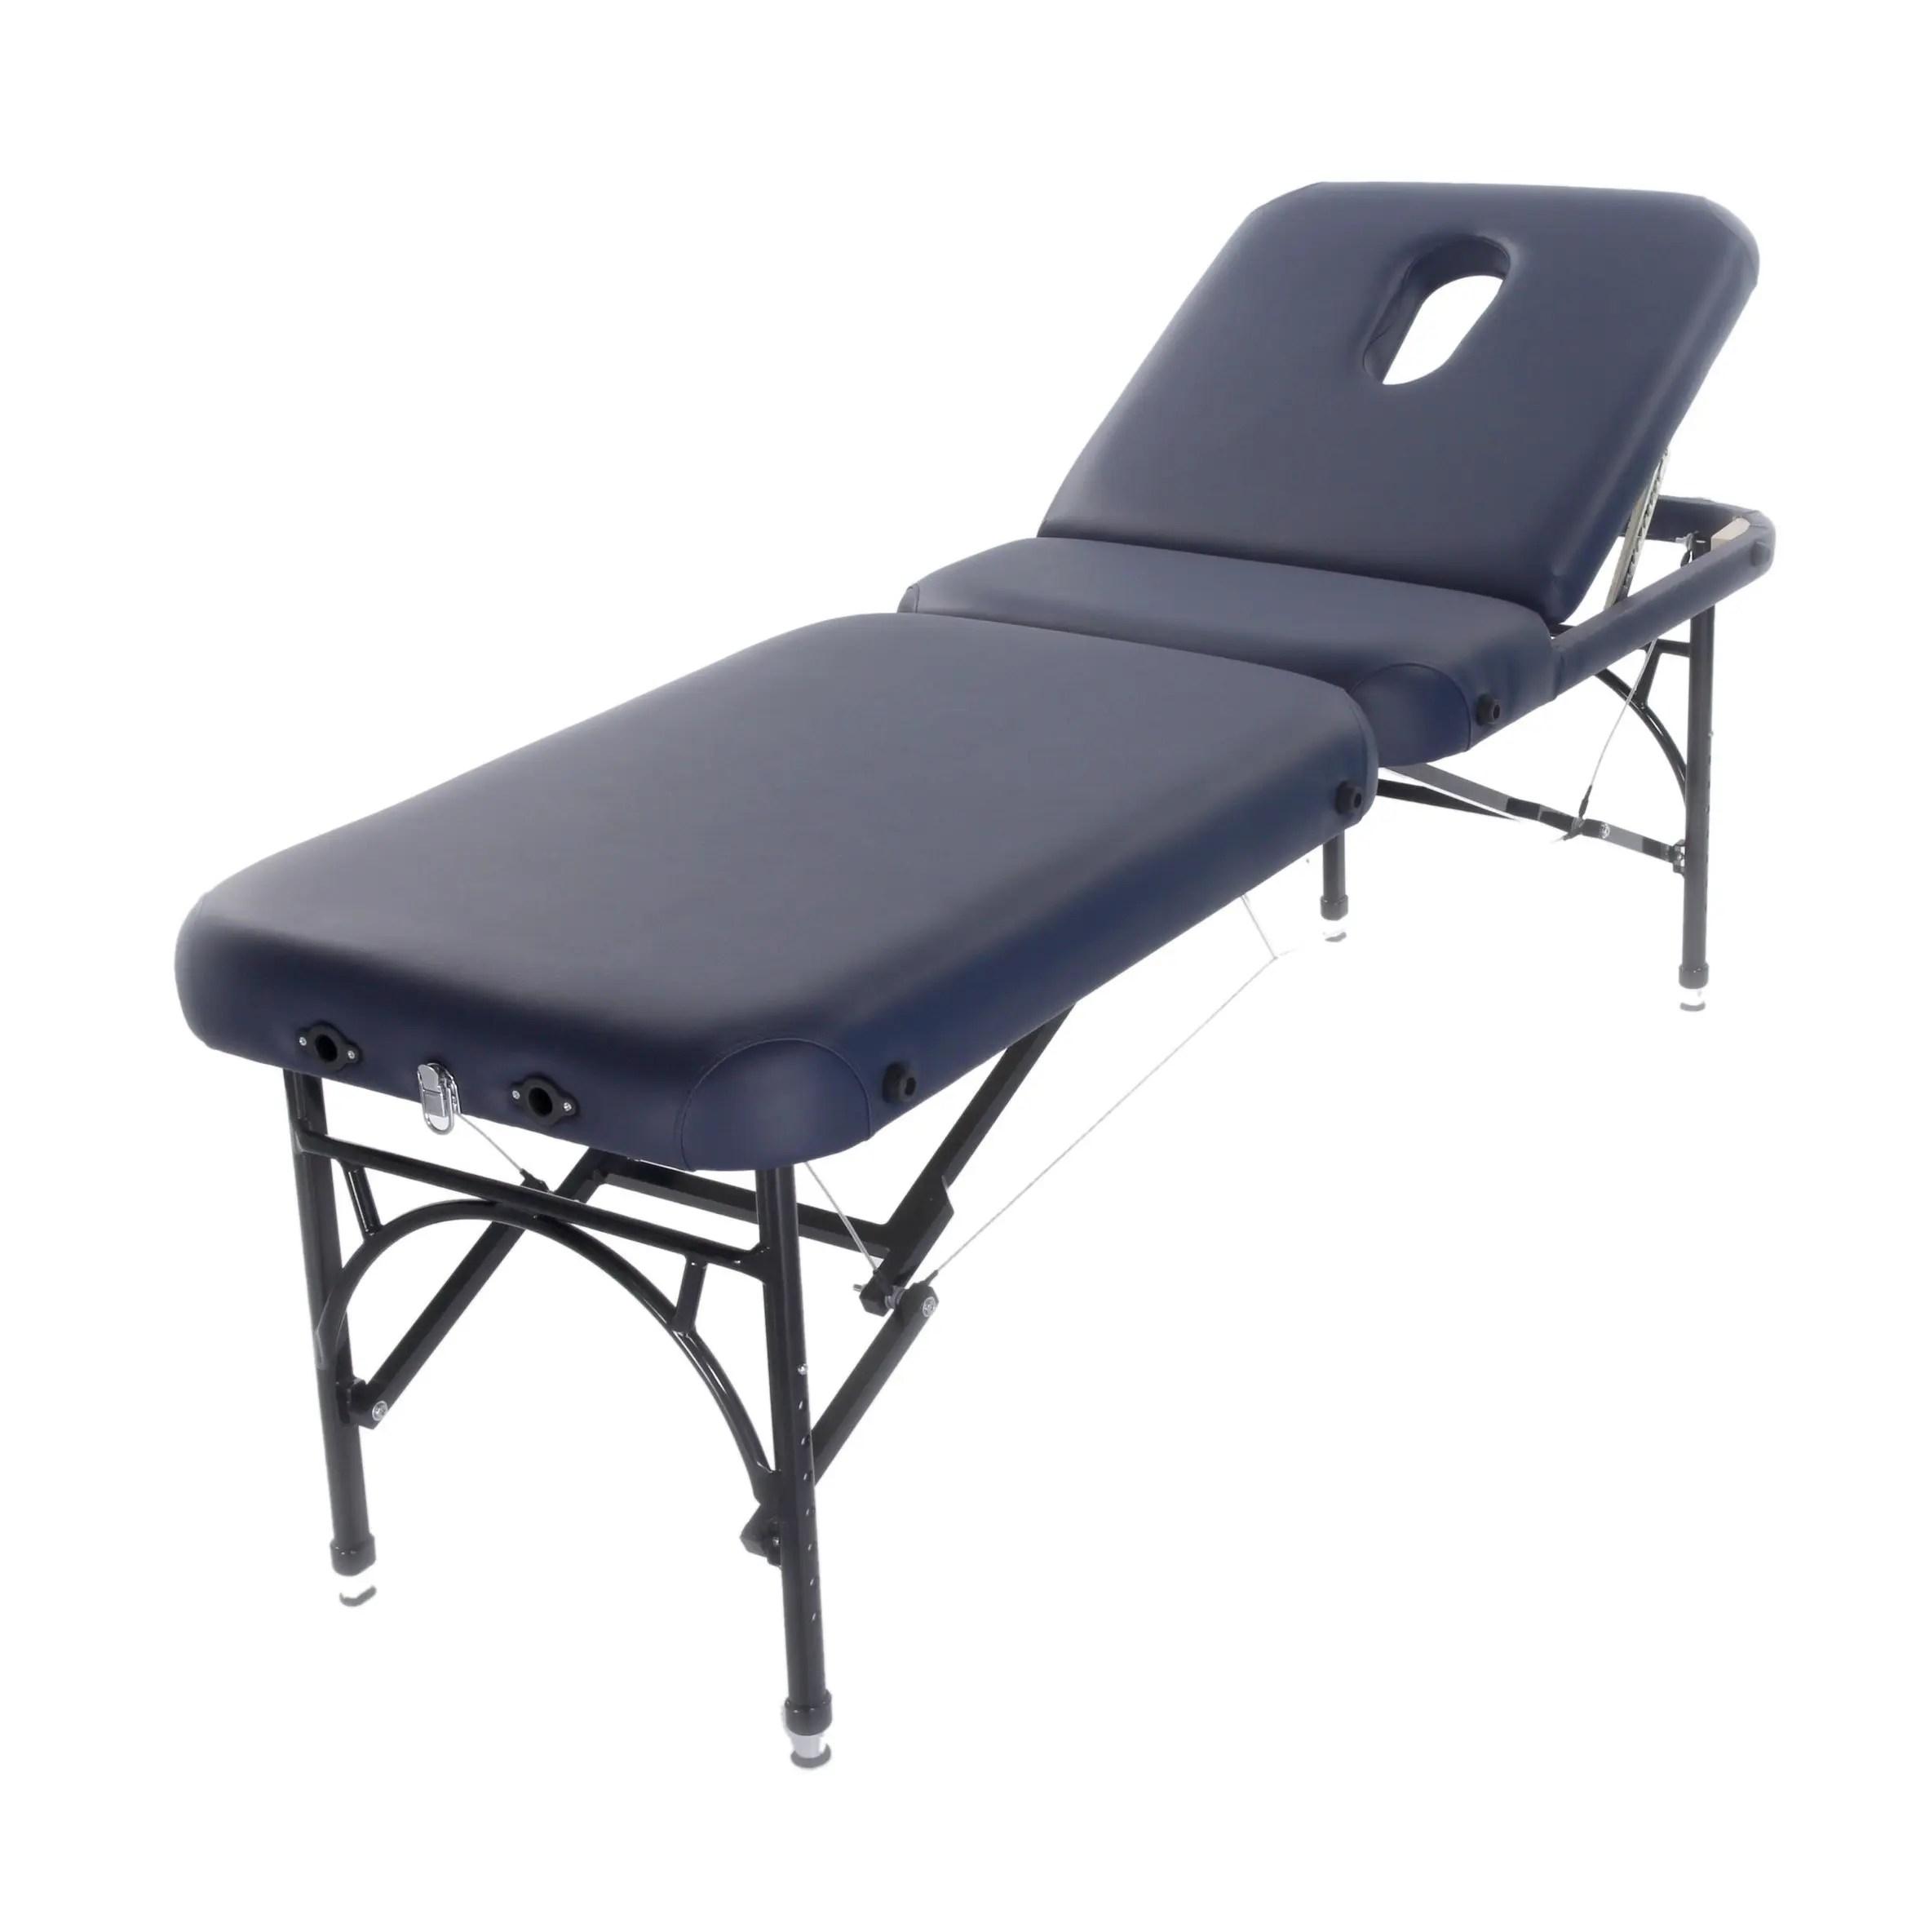 Affinity Marlin Portable Massage Table Body Massage Shop